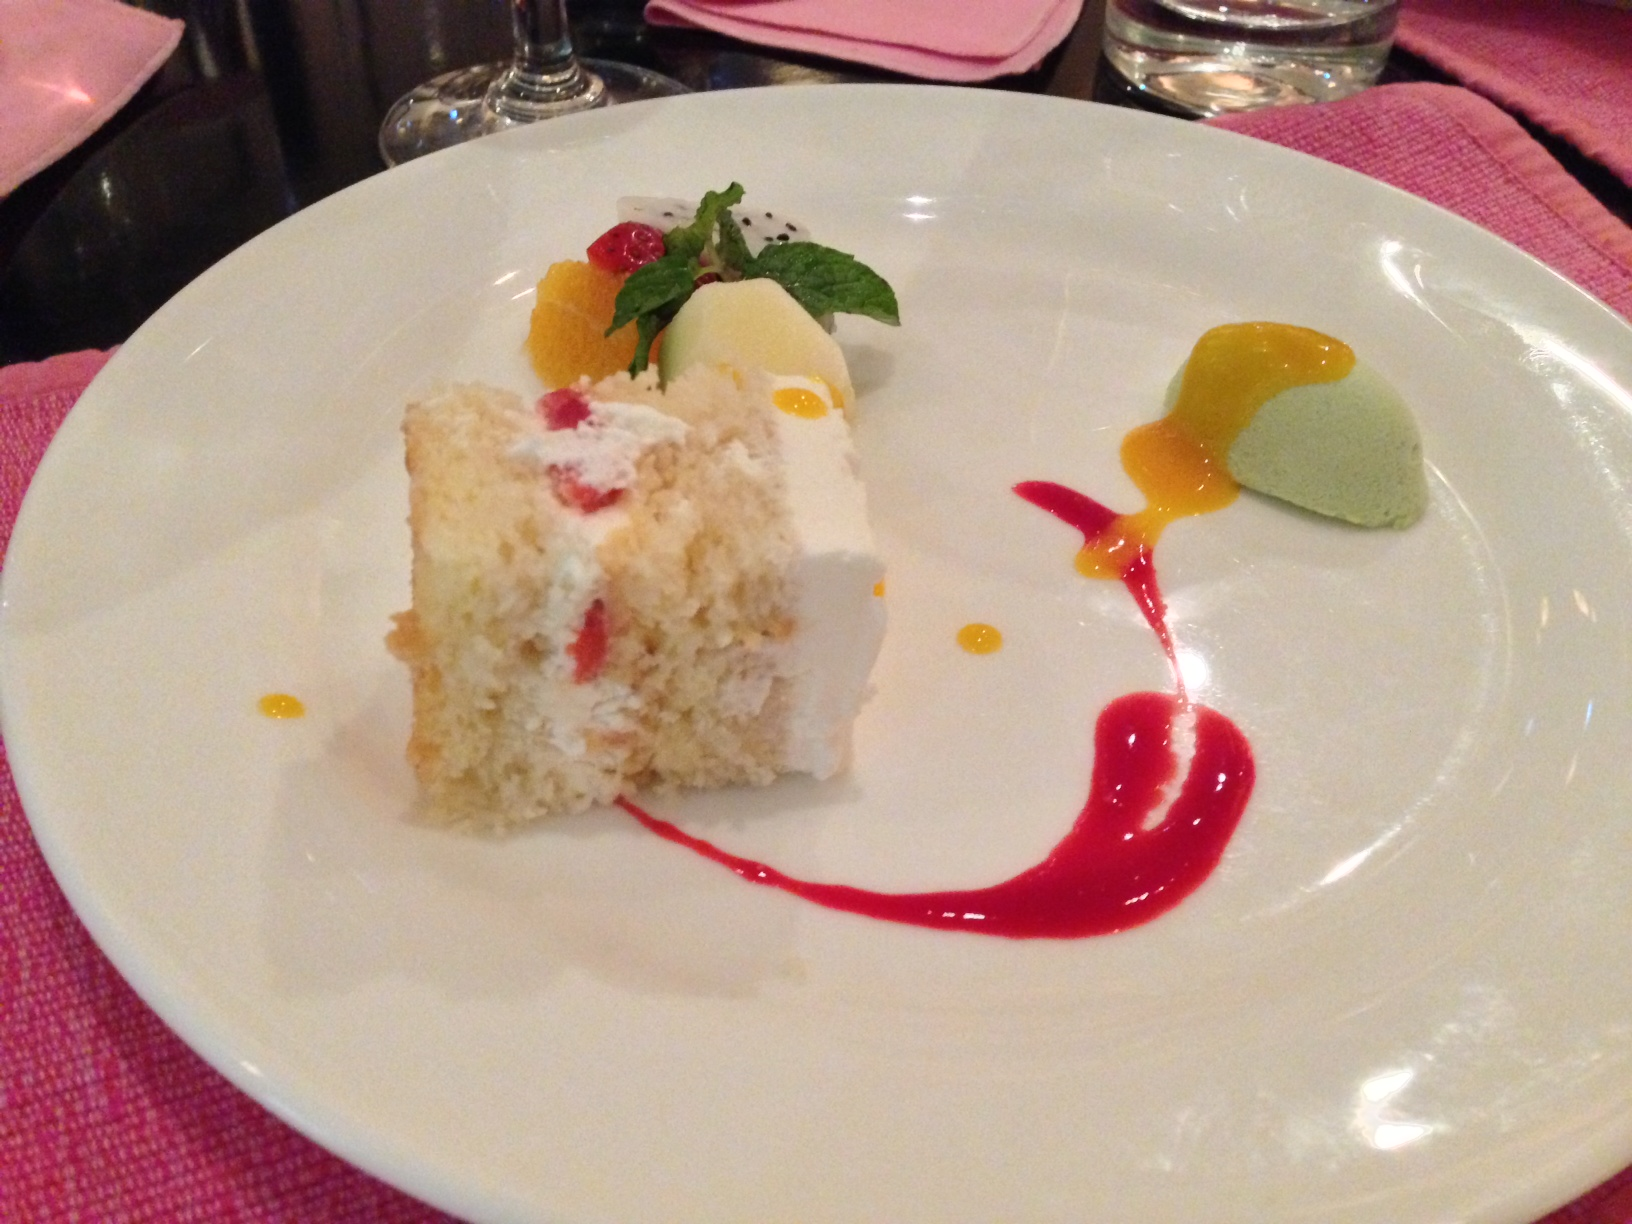 Strawberry Cheesecake, Green Tea Matcha and Fruits